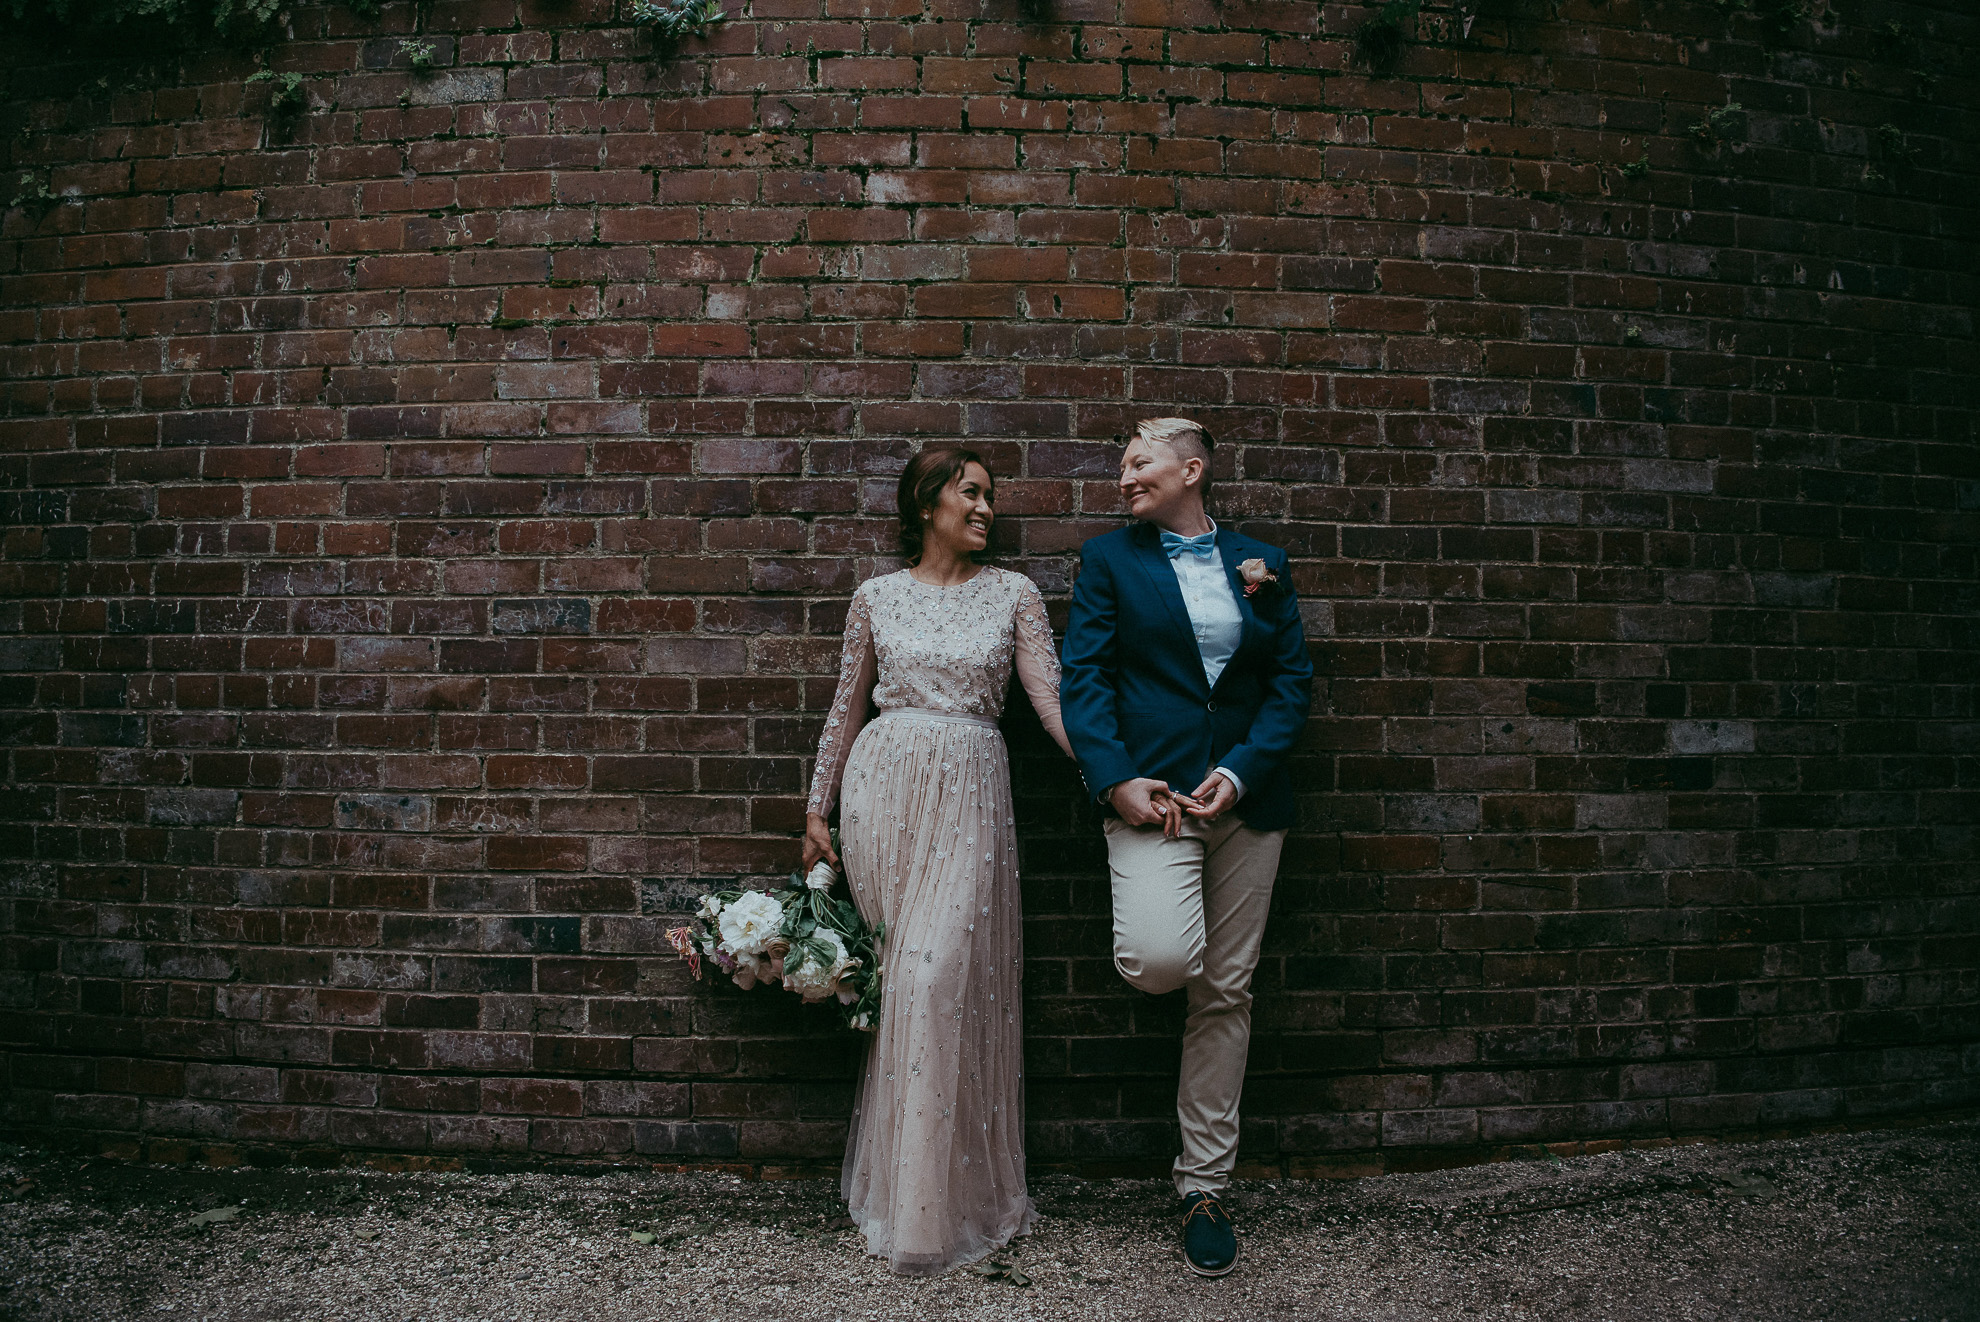 Auckland City WEDDING - Domain {New Zealand elopement-weddings photographers} WinterGardens